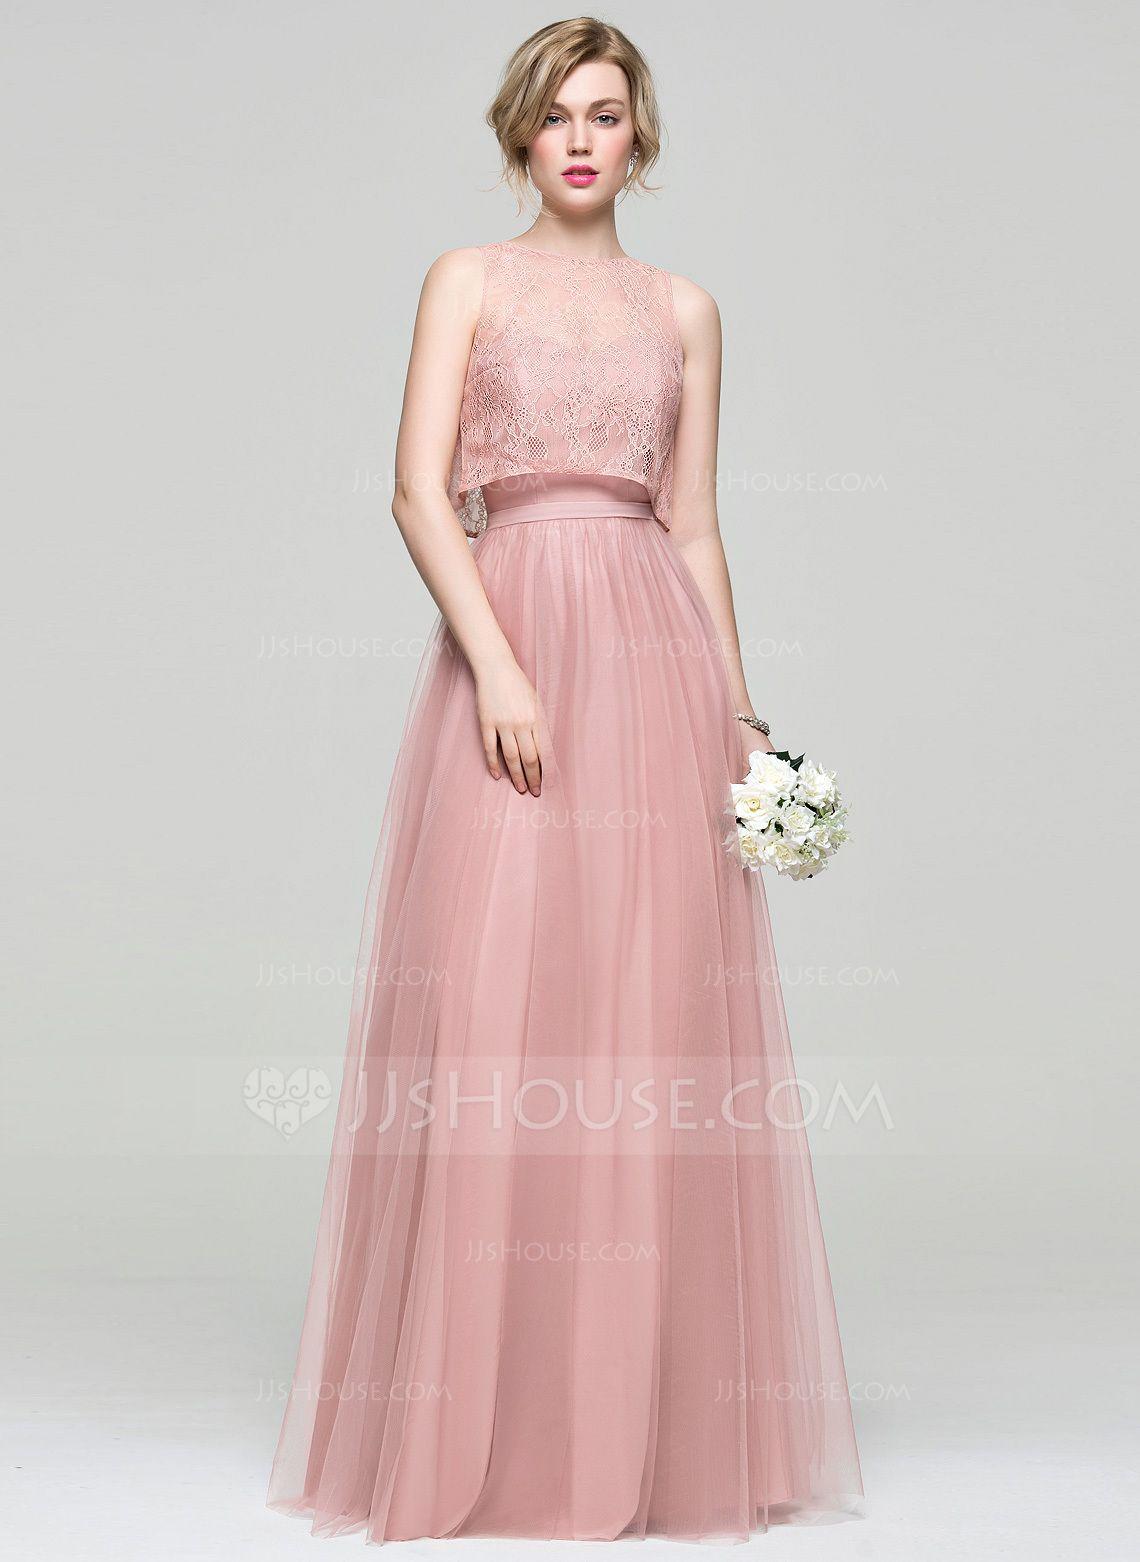 Lace wedding dress tulle november 2018 ALinePrincess Sweetheart FloorLength Tulle Bridesmaid Dress